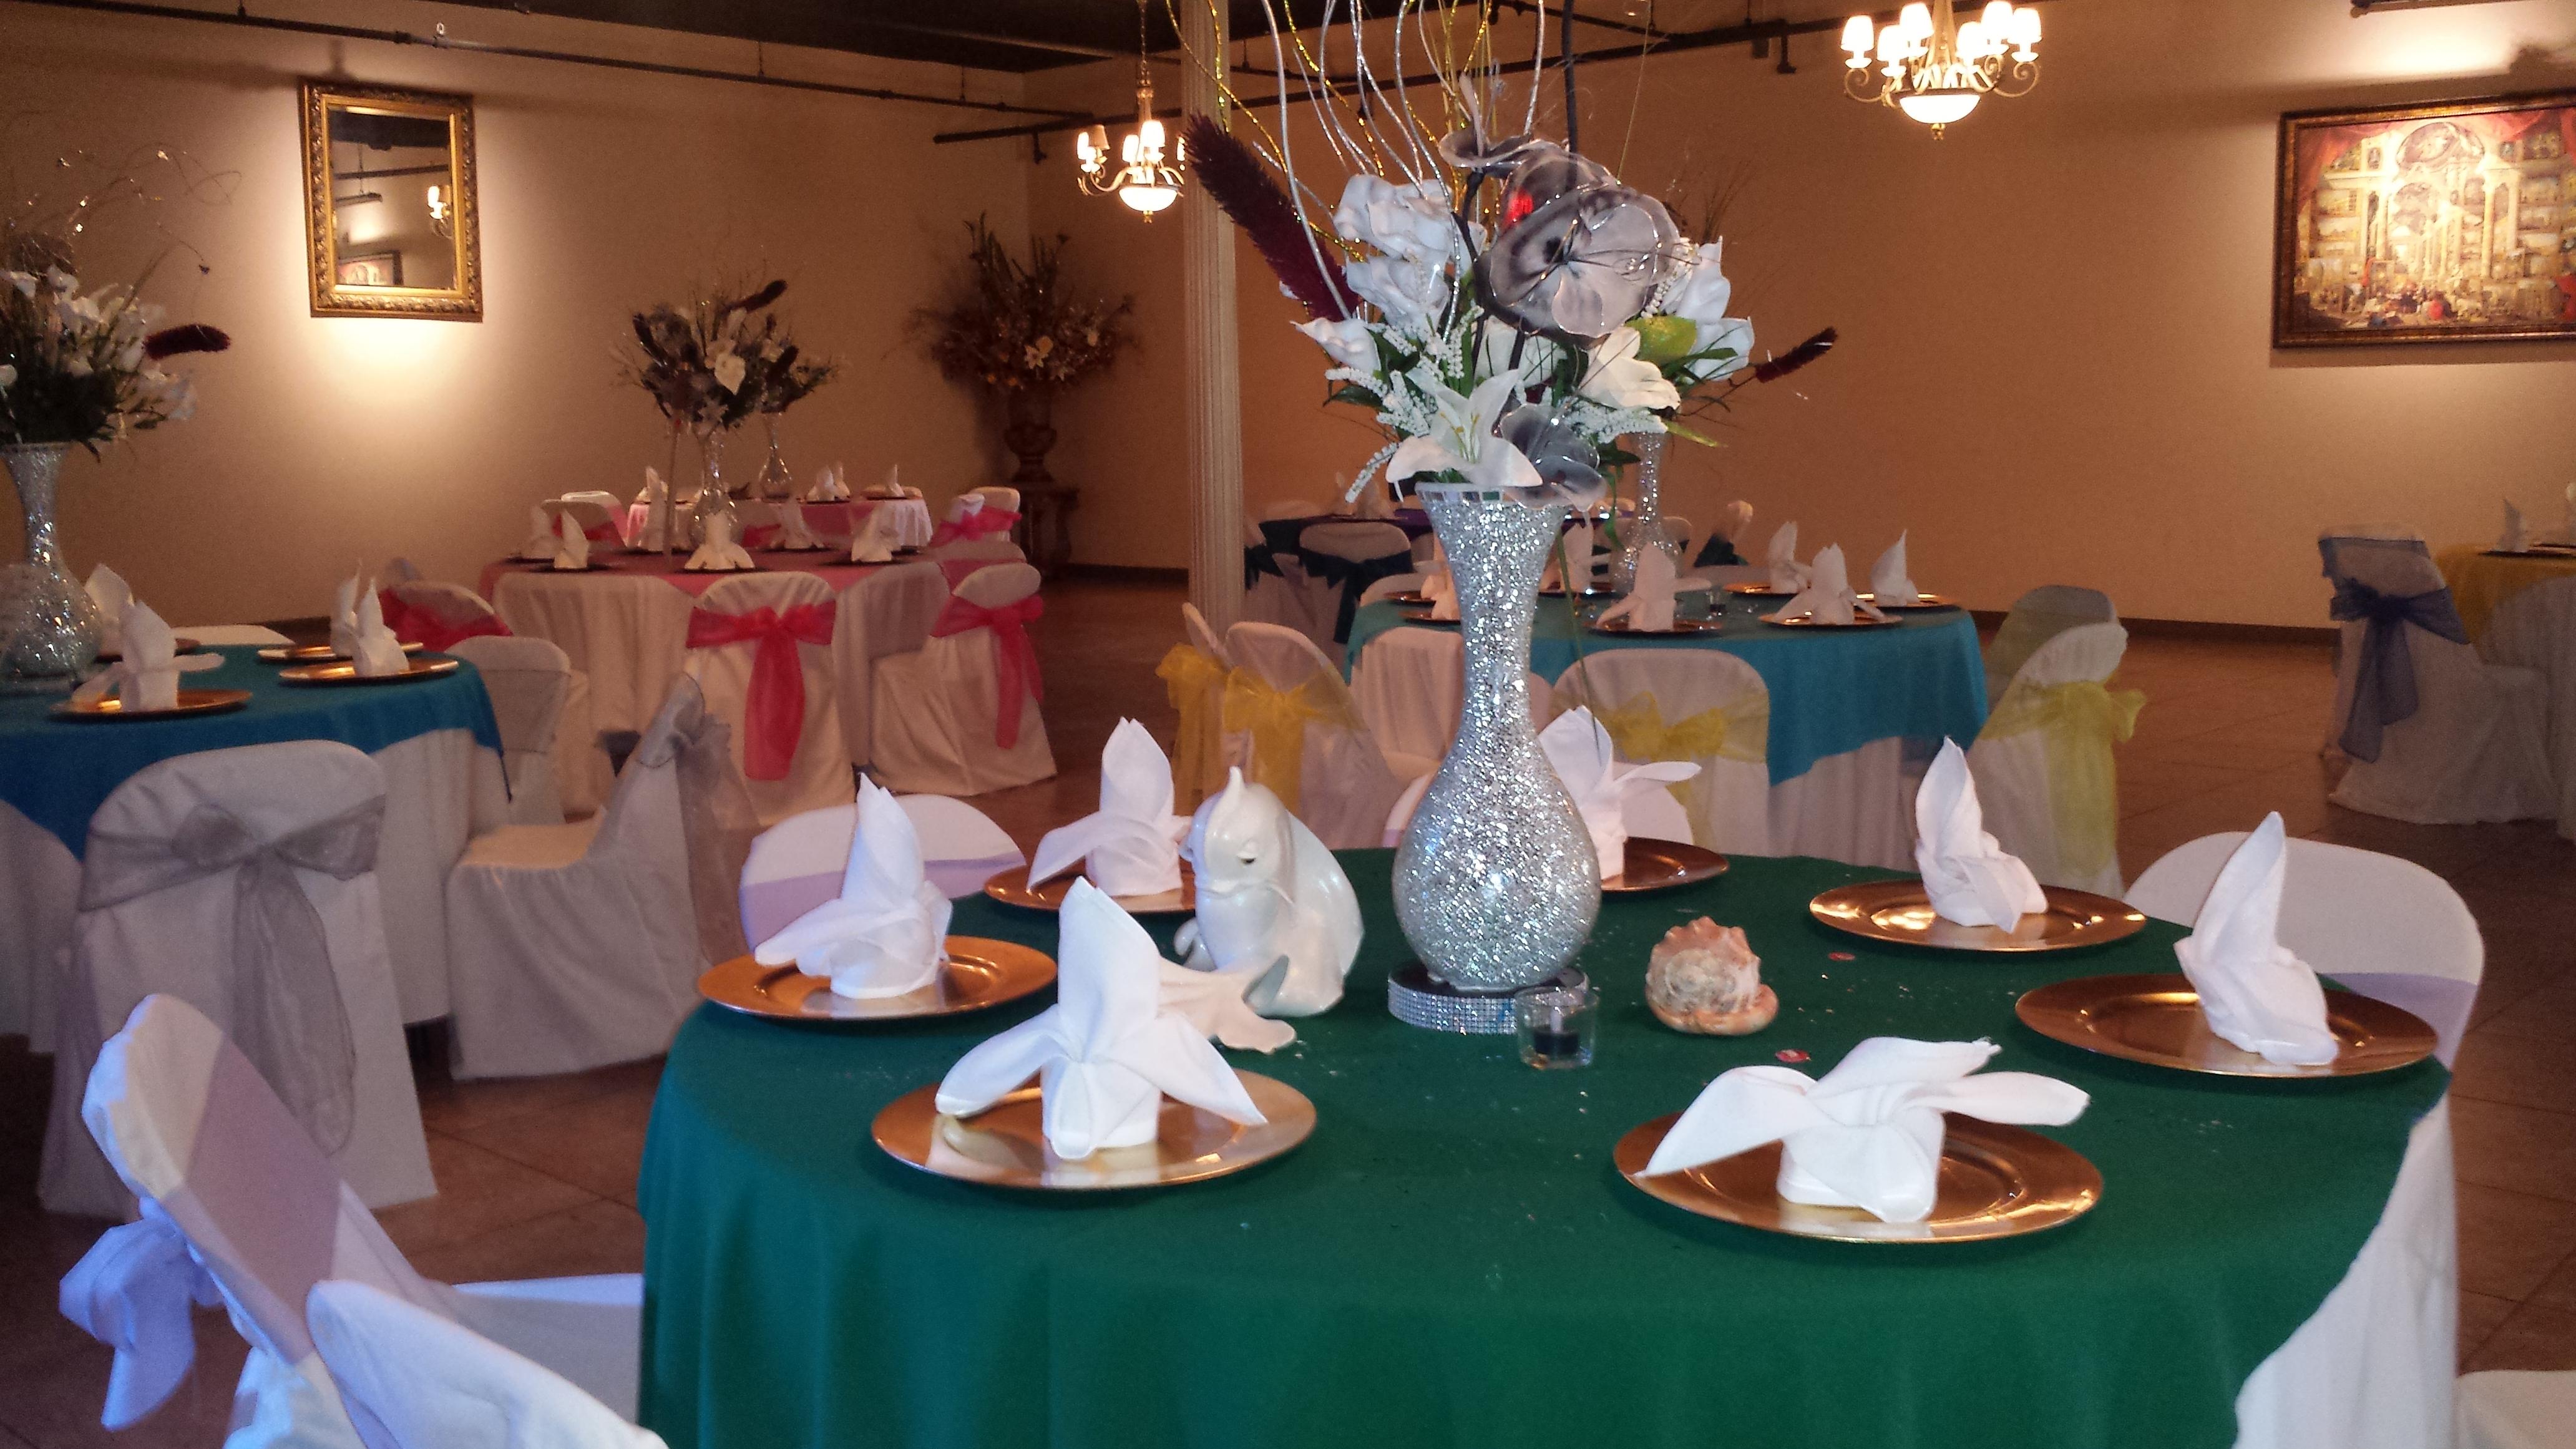 Festive tables tonight